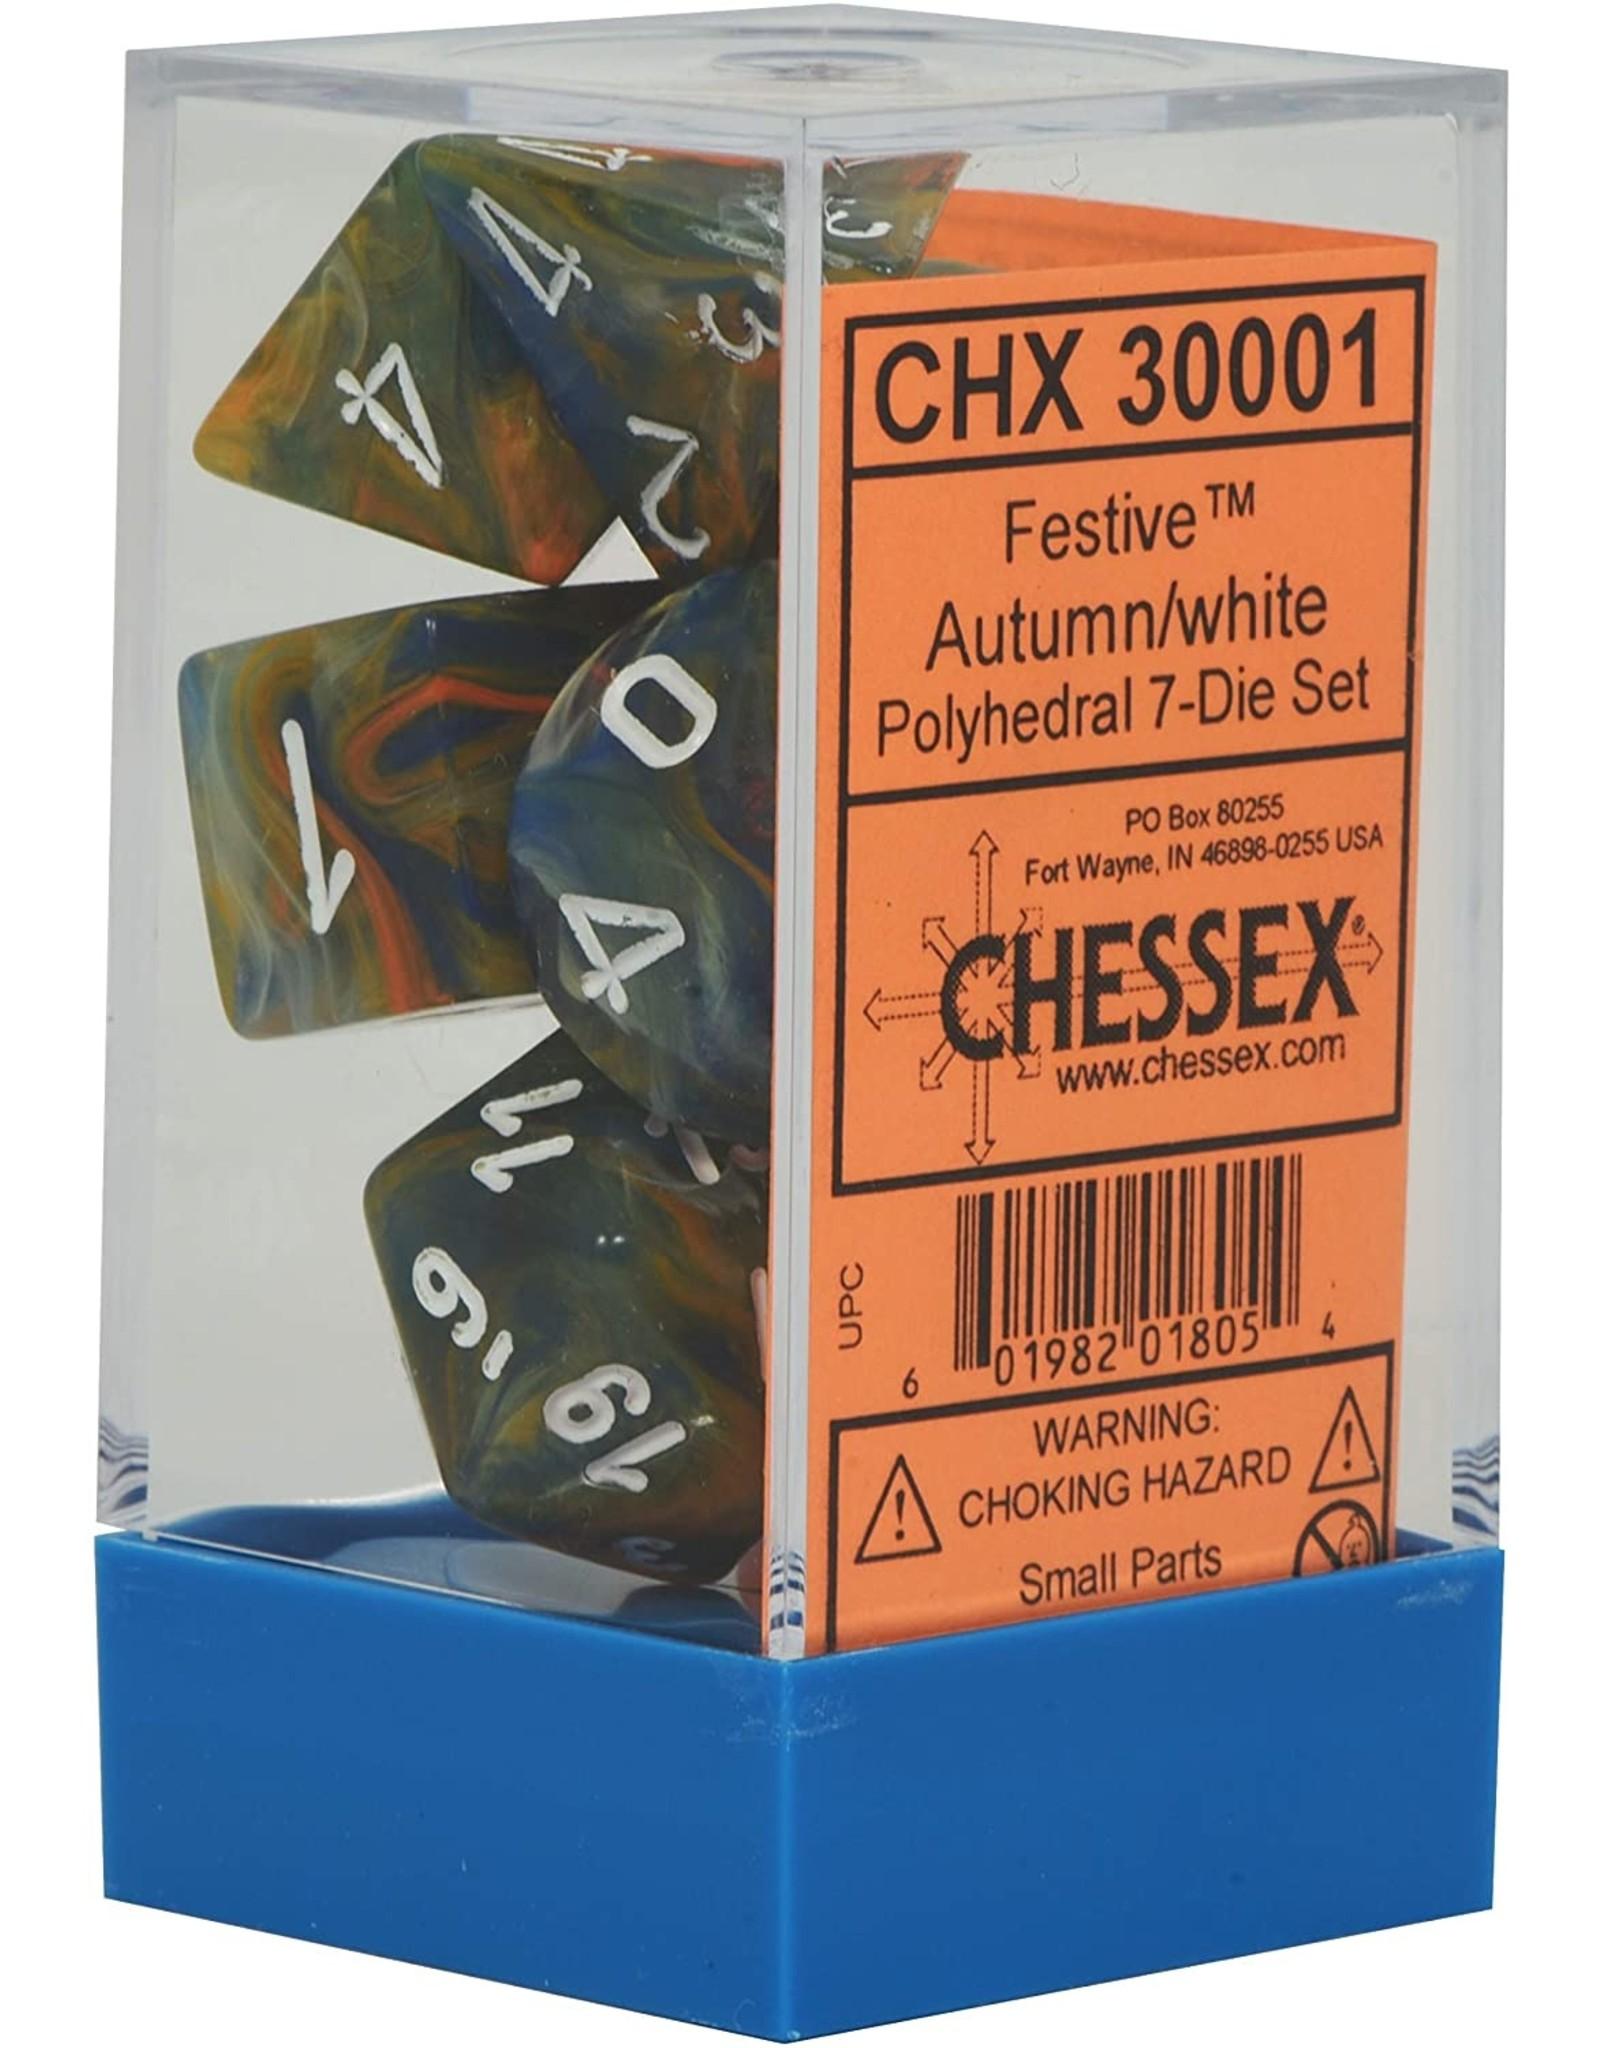 CHESSEX CHX 30001 LAB DICE 7 PC POLY DICE SET FESTIVE AUTUMN/WHITE